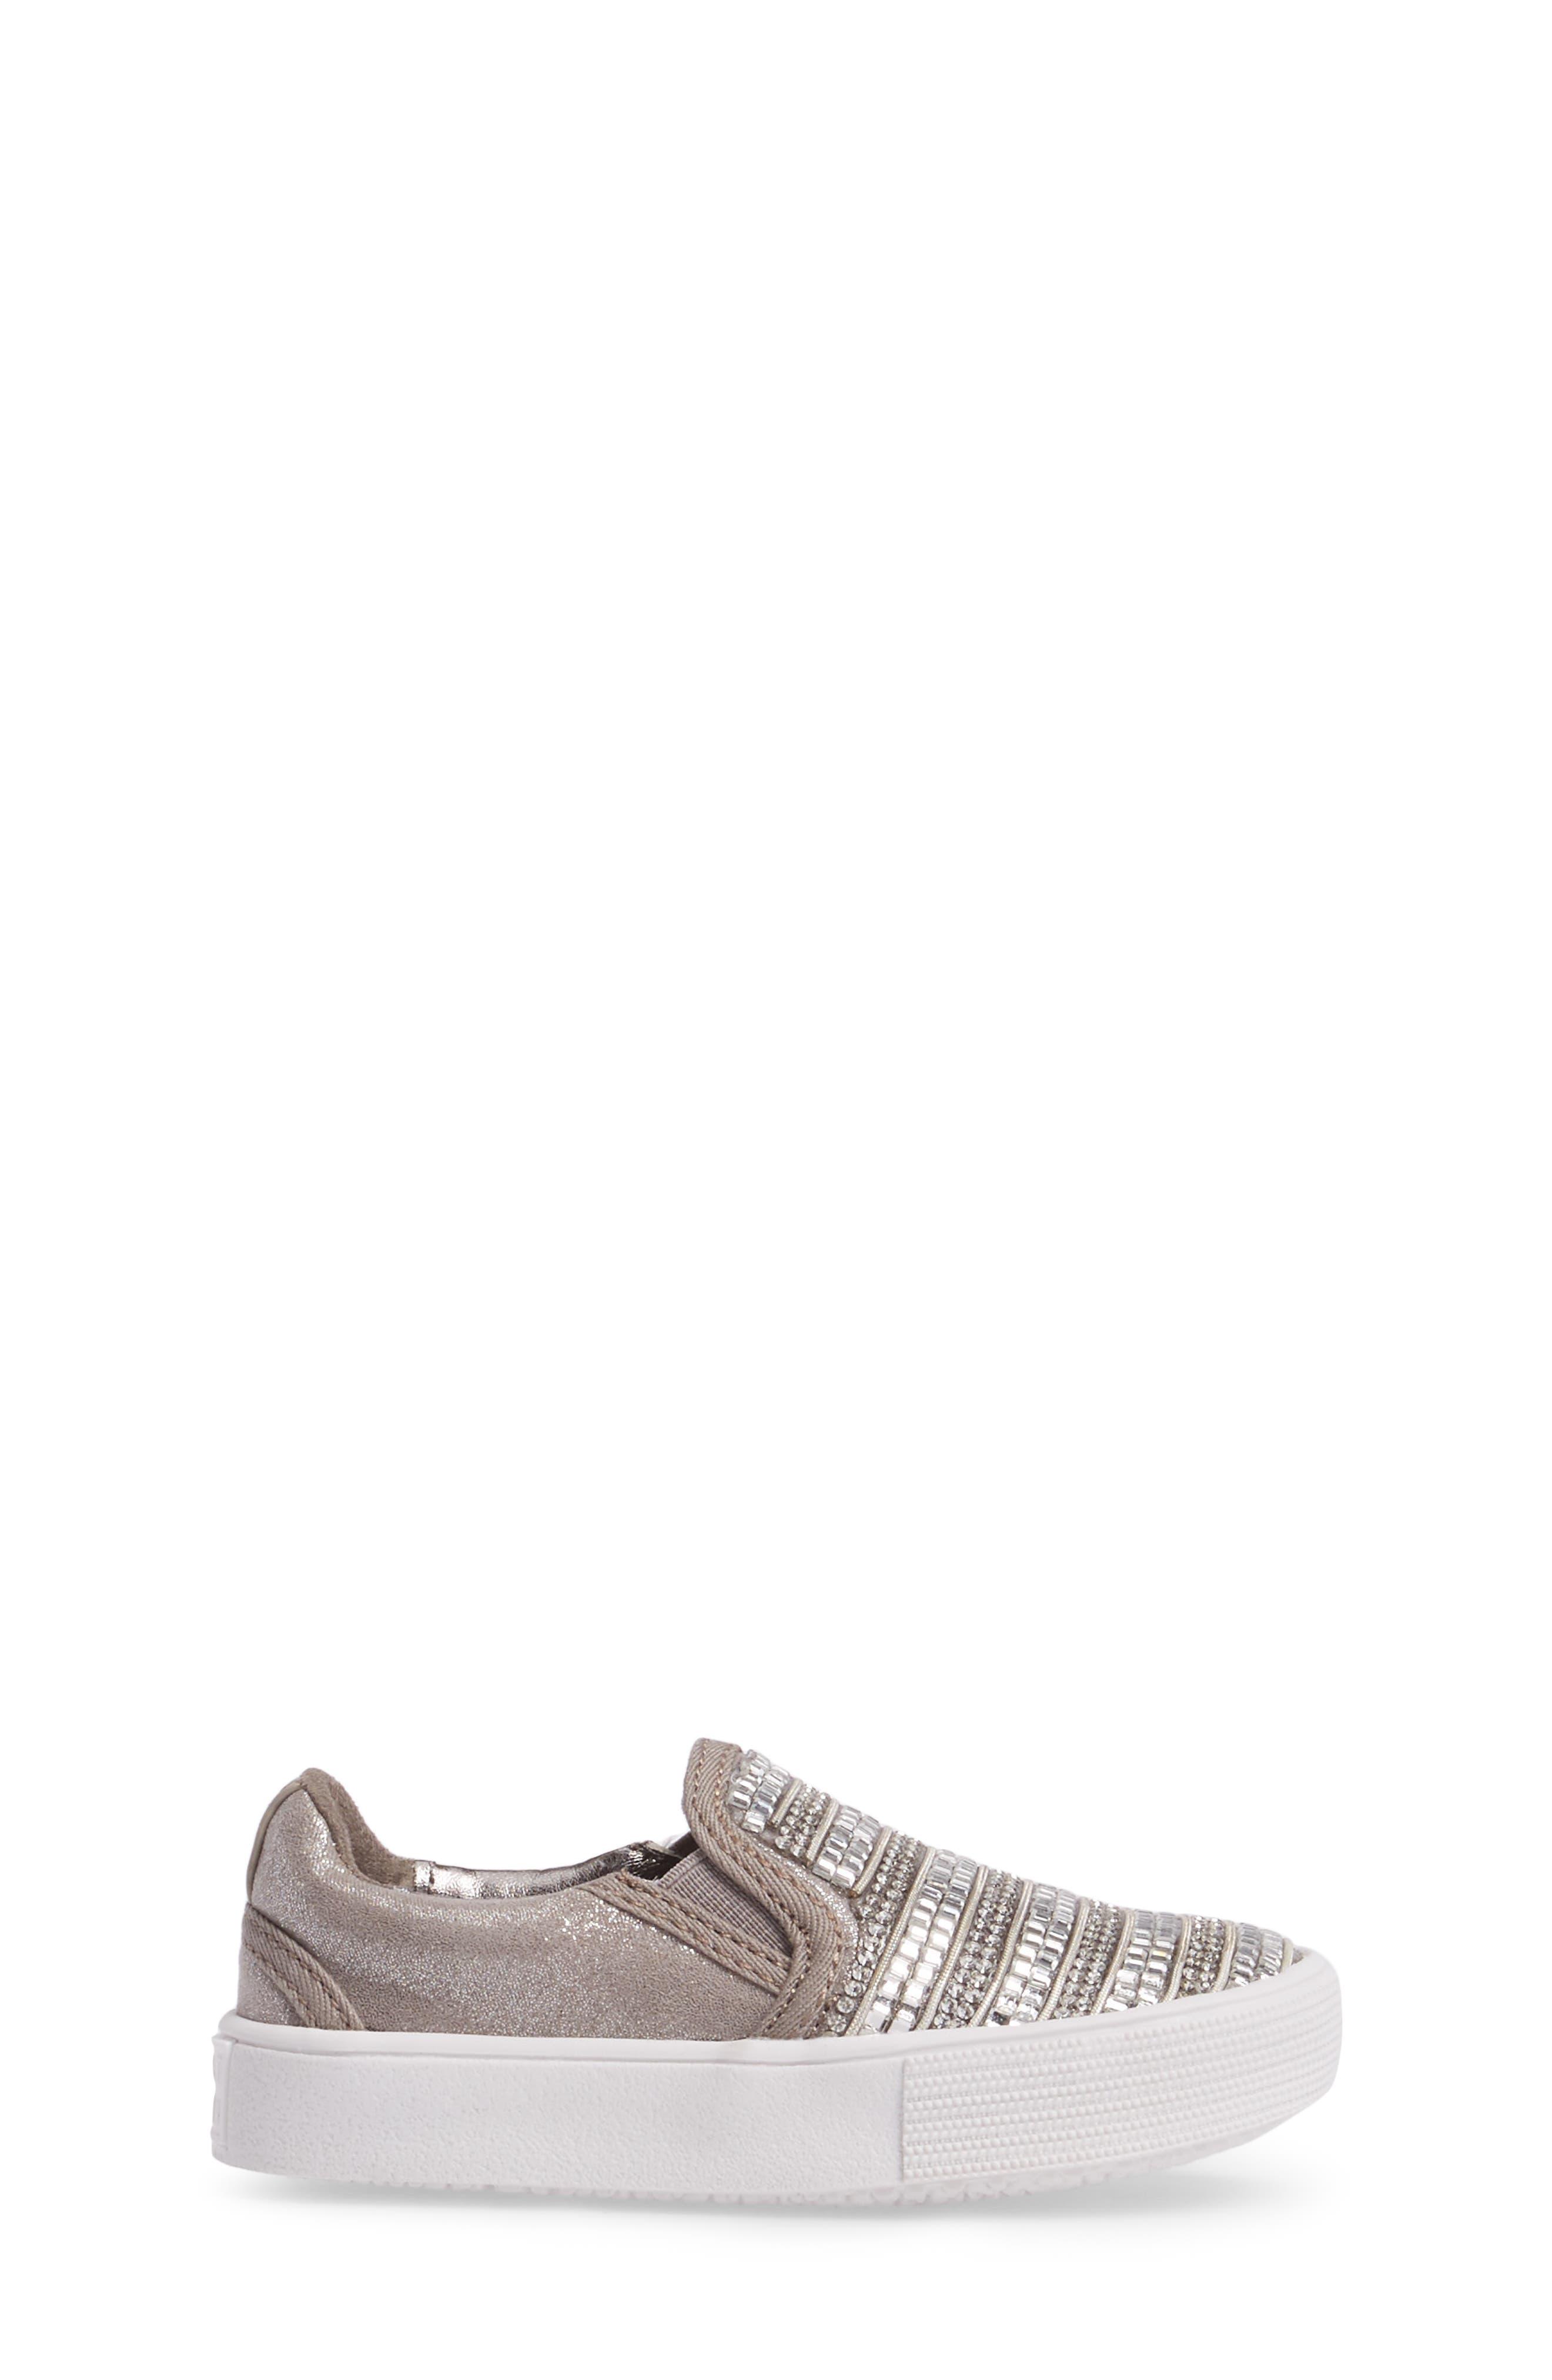 Alternate Image 3  - Stuart Weitzman Vance Glitz Embellished Slip-On Sneaker (Walker & Toddler)